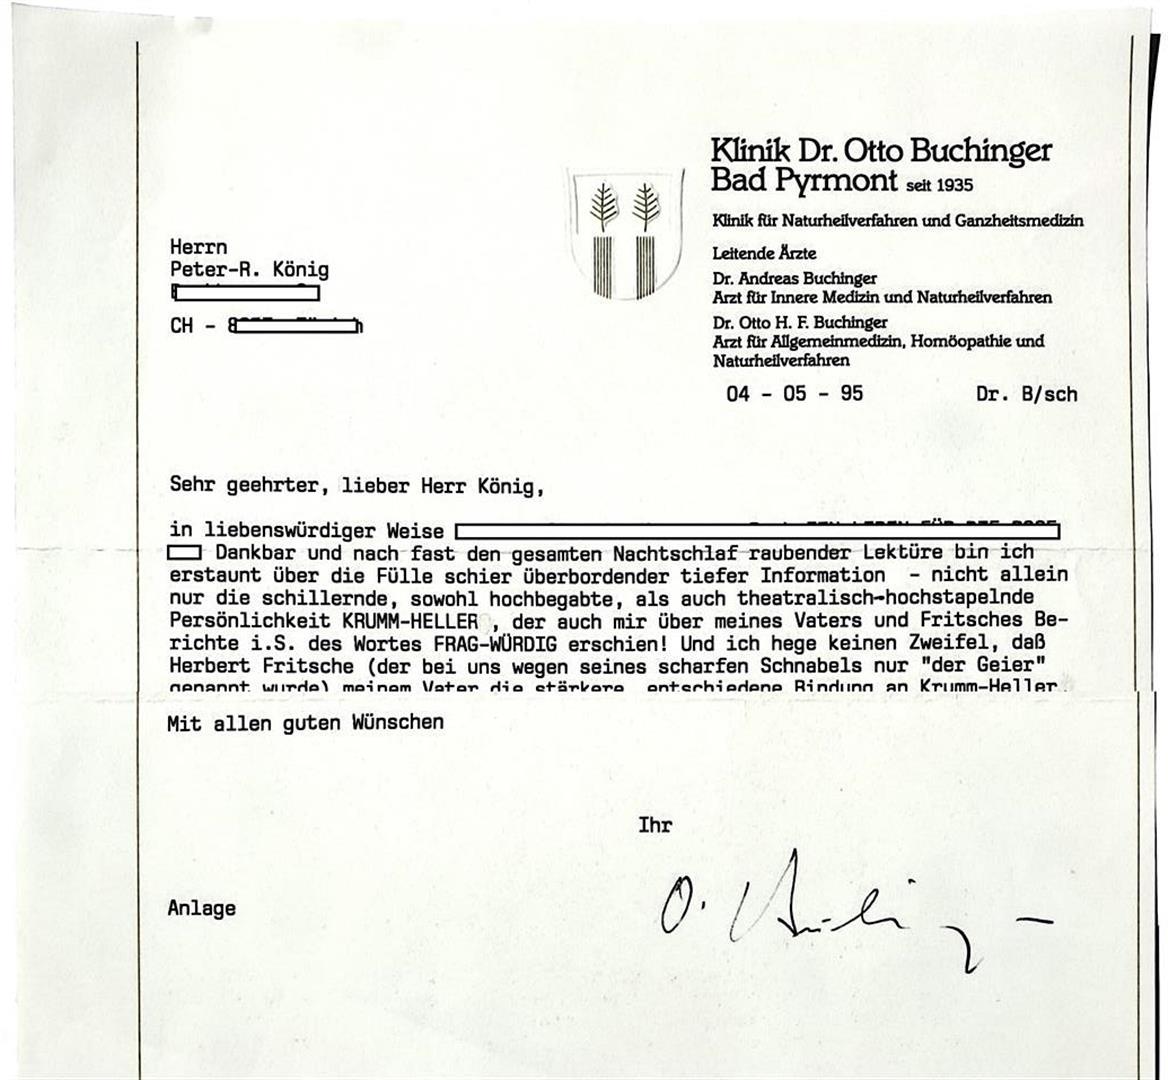 Otto Buchinger Herbert Fritsche Arnoldo Krumm-Heller Peter-Robert Koenig